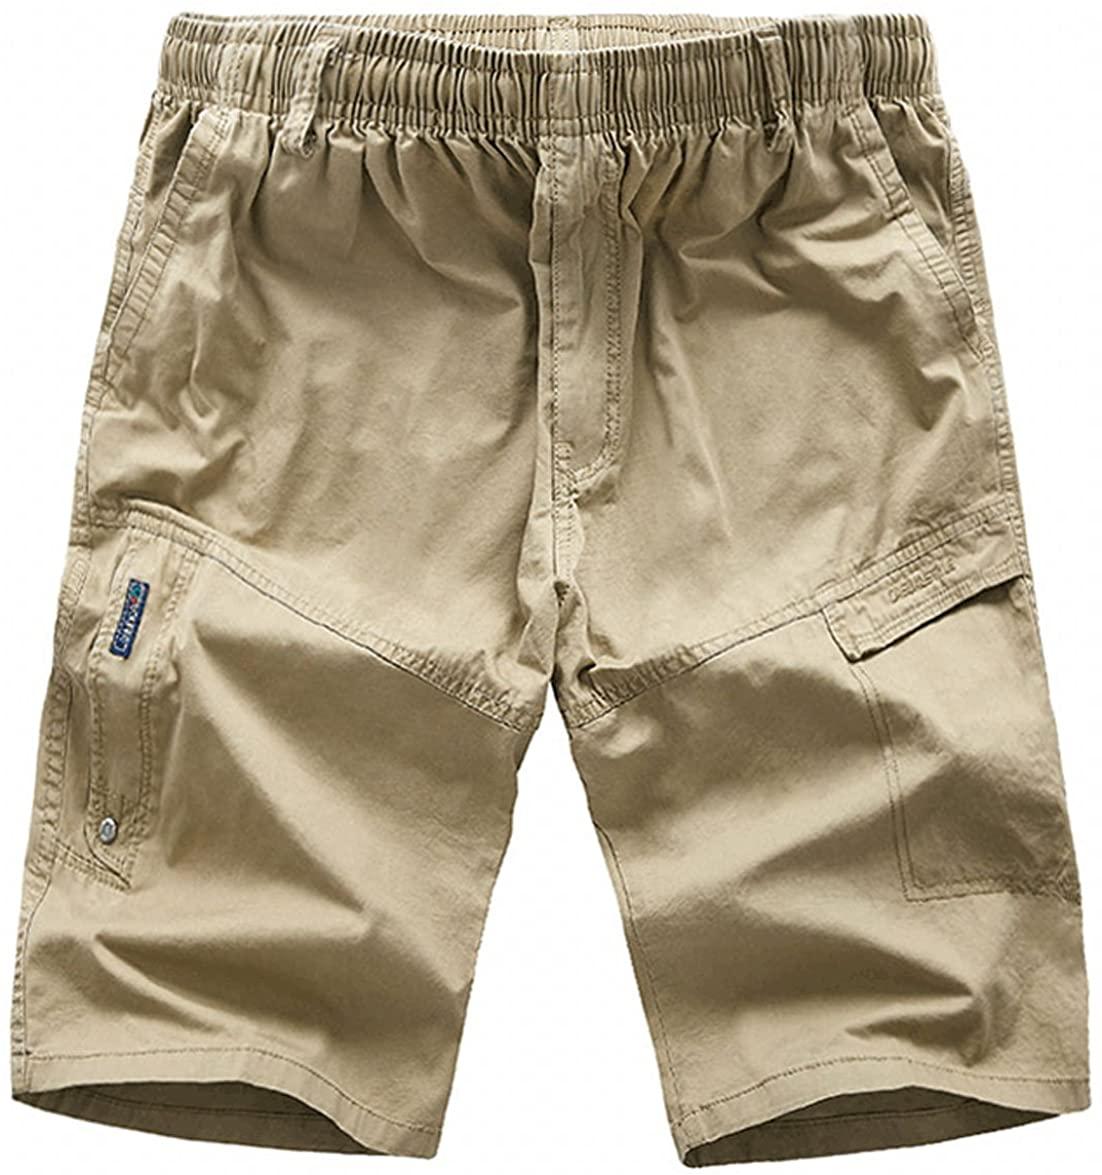 chouyatou Men's Casual Elastic-Waist Loose Multi-Pocket Chino Cargo Work Shorts